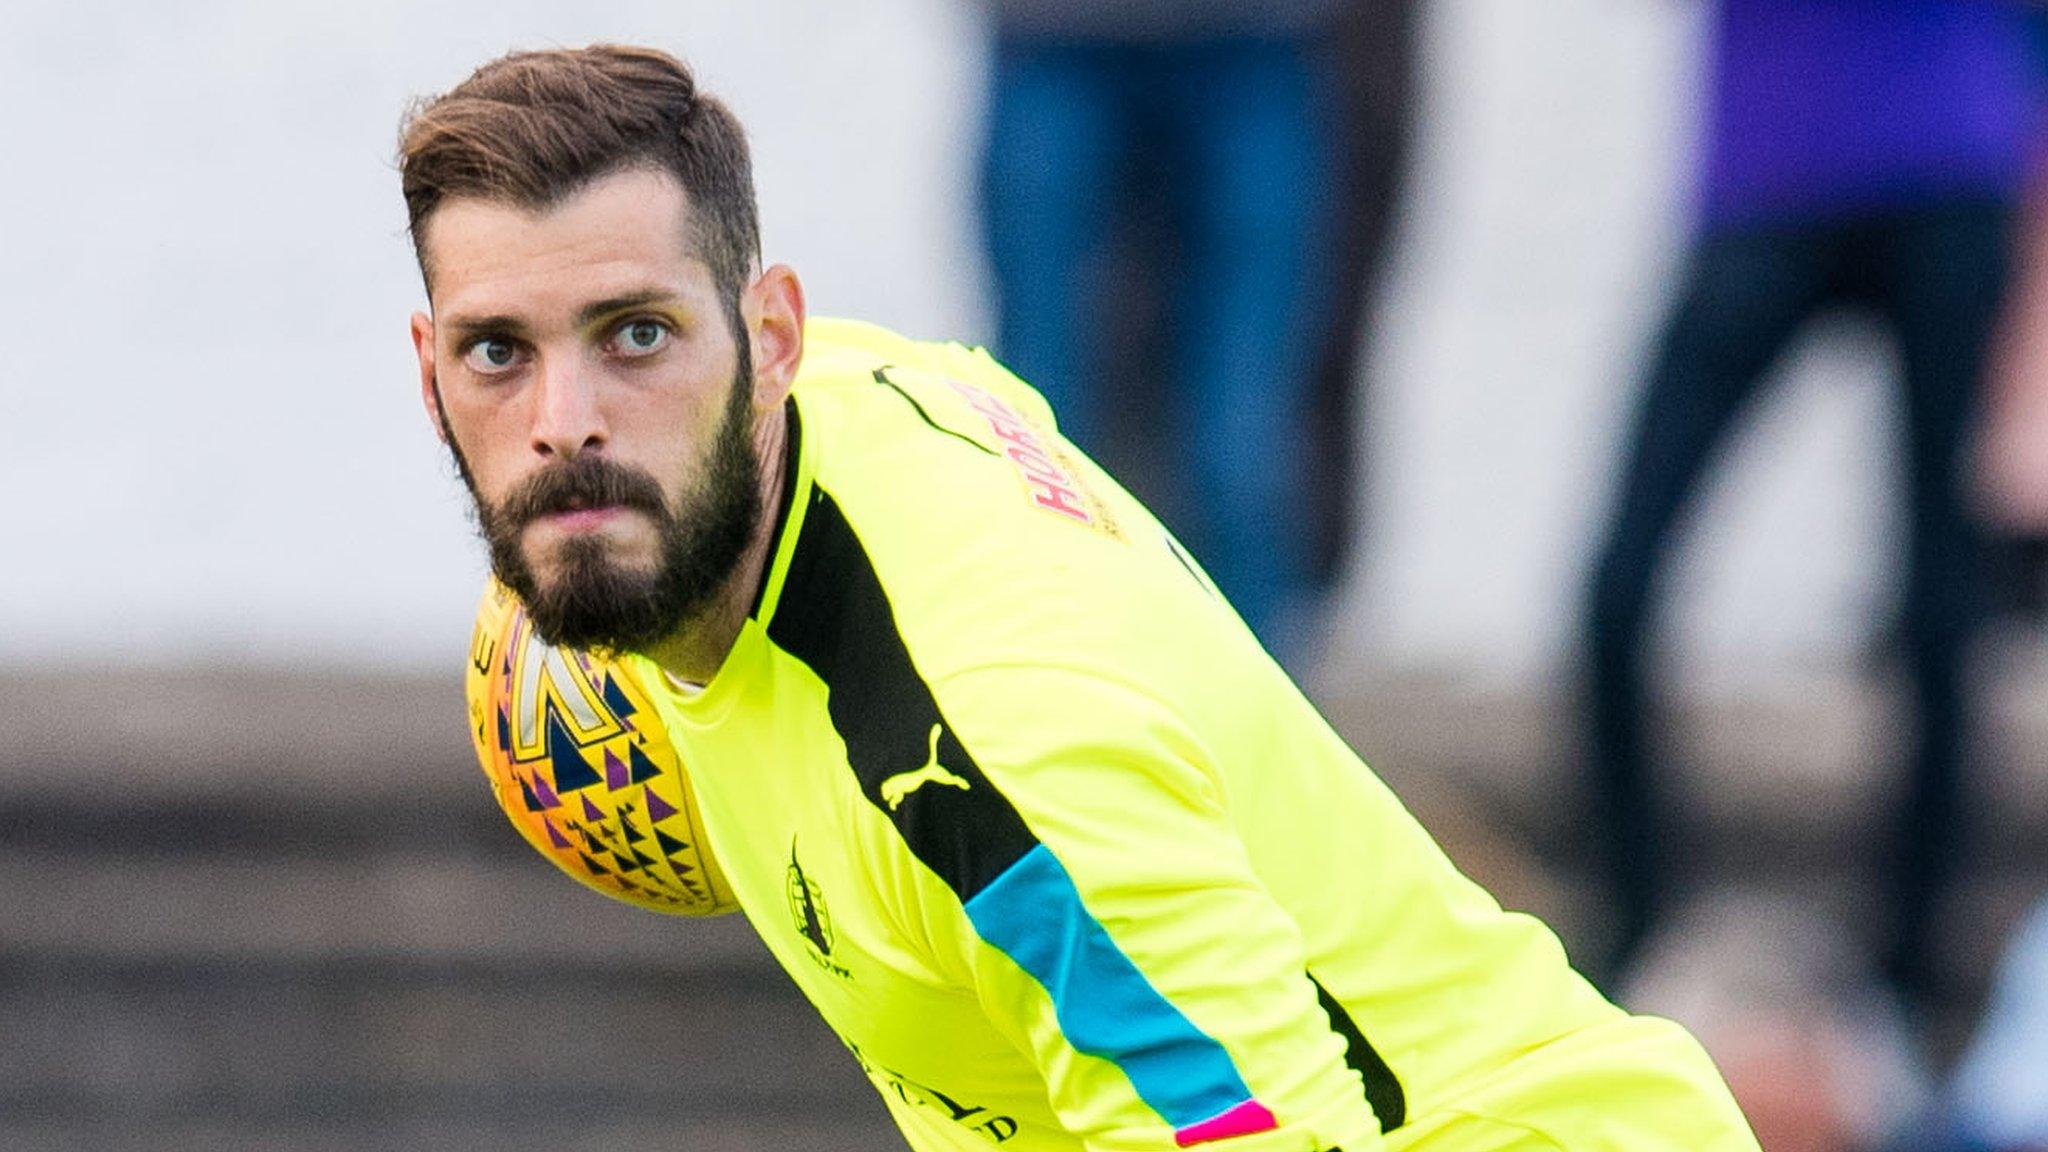 Ayr United 3-2 Falkirk: Fasan own goal gifts Ayr victory